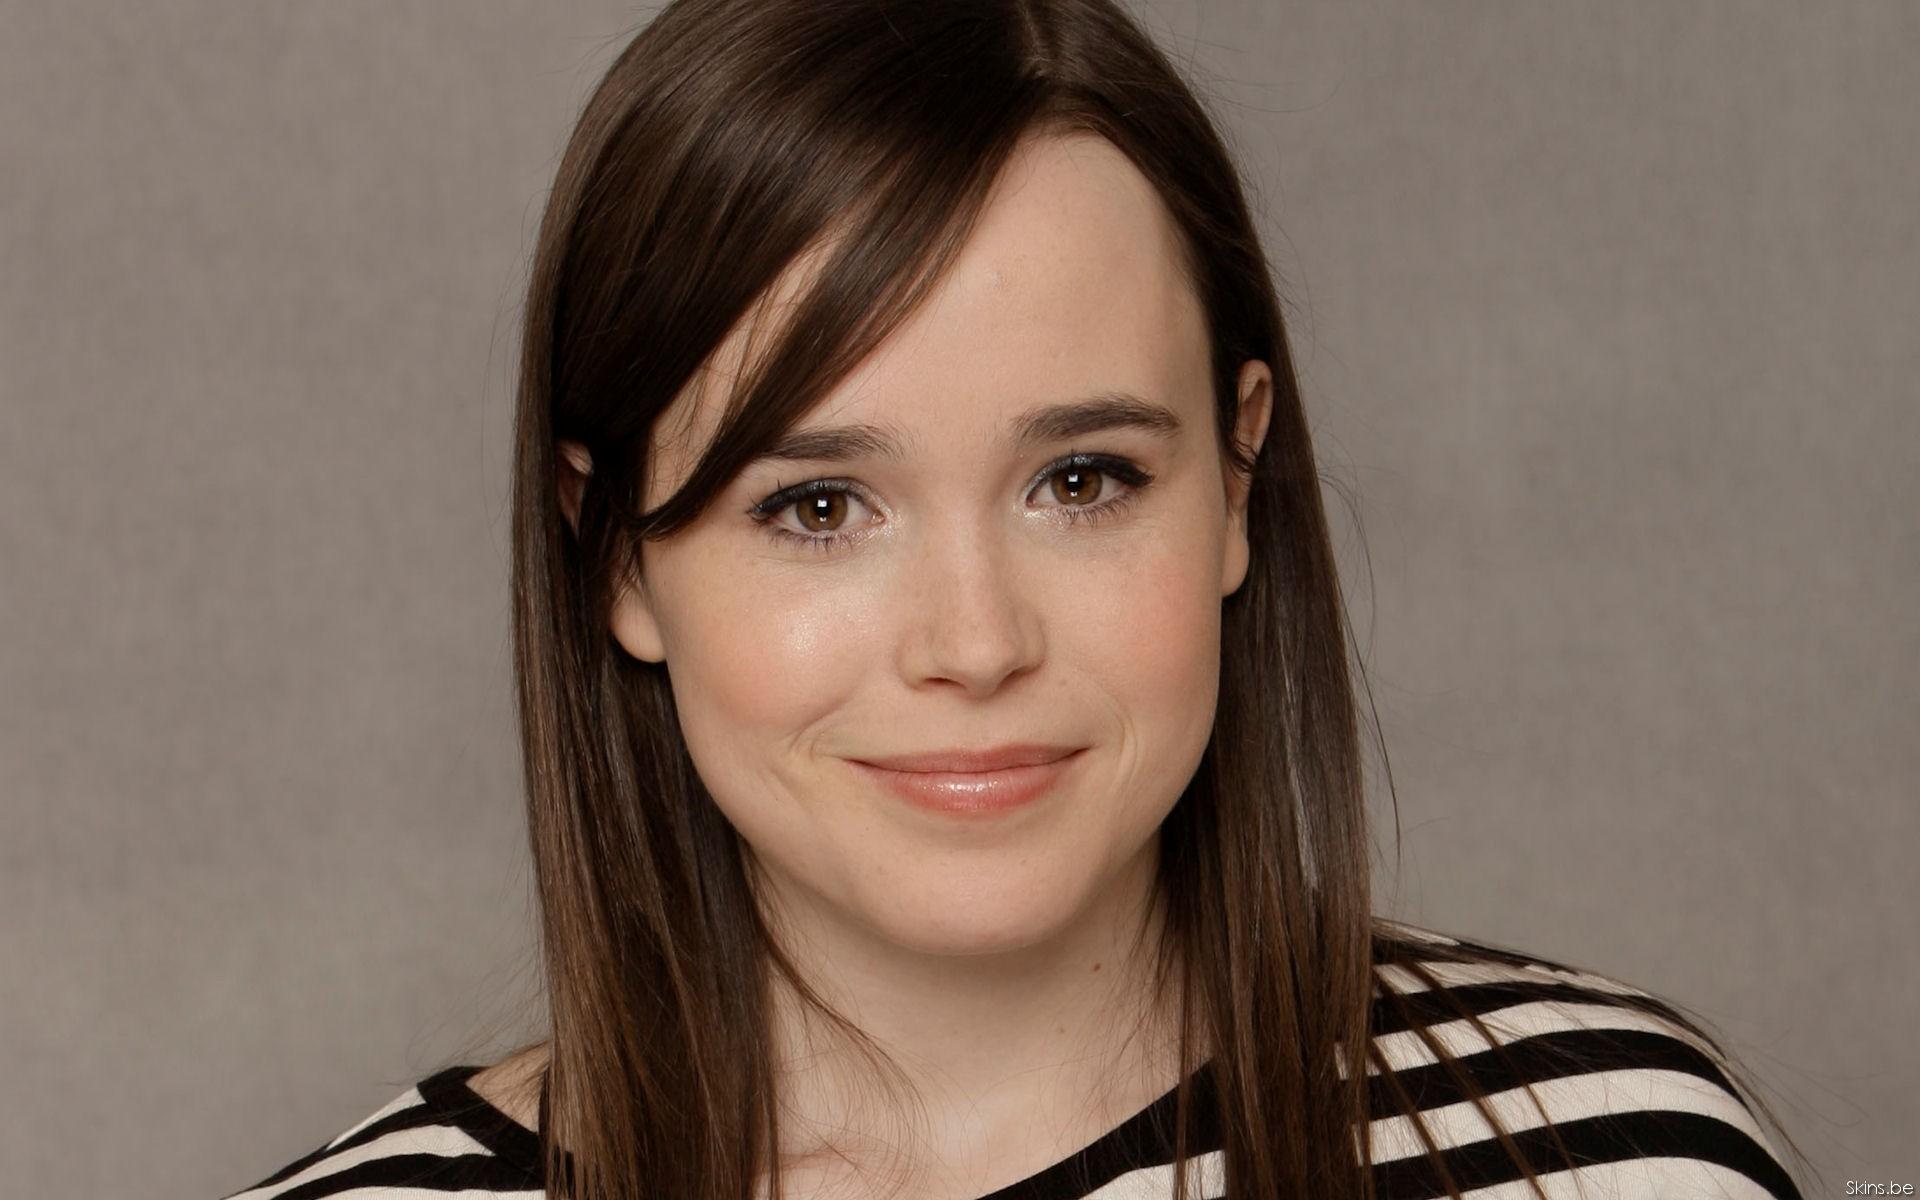 Ellen page rostro hermoso - 1920x1200